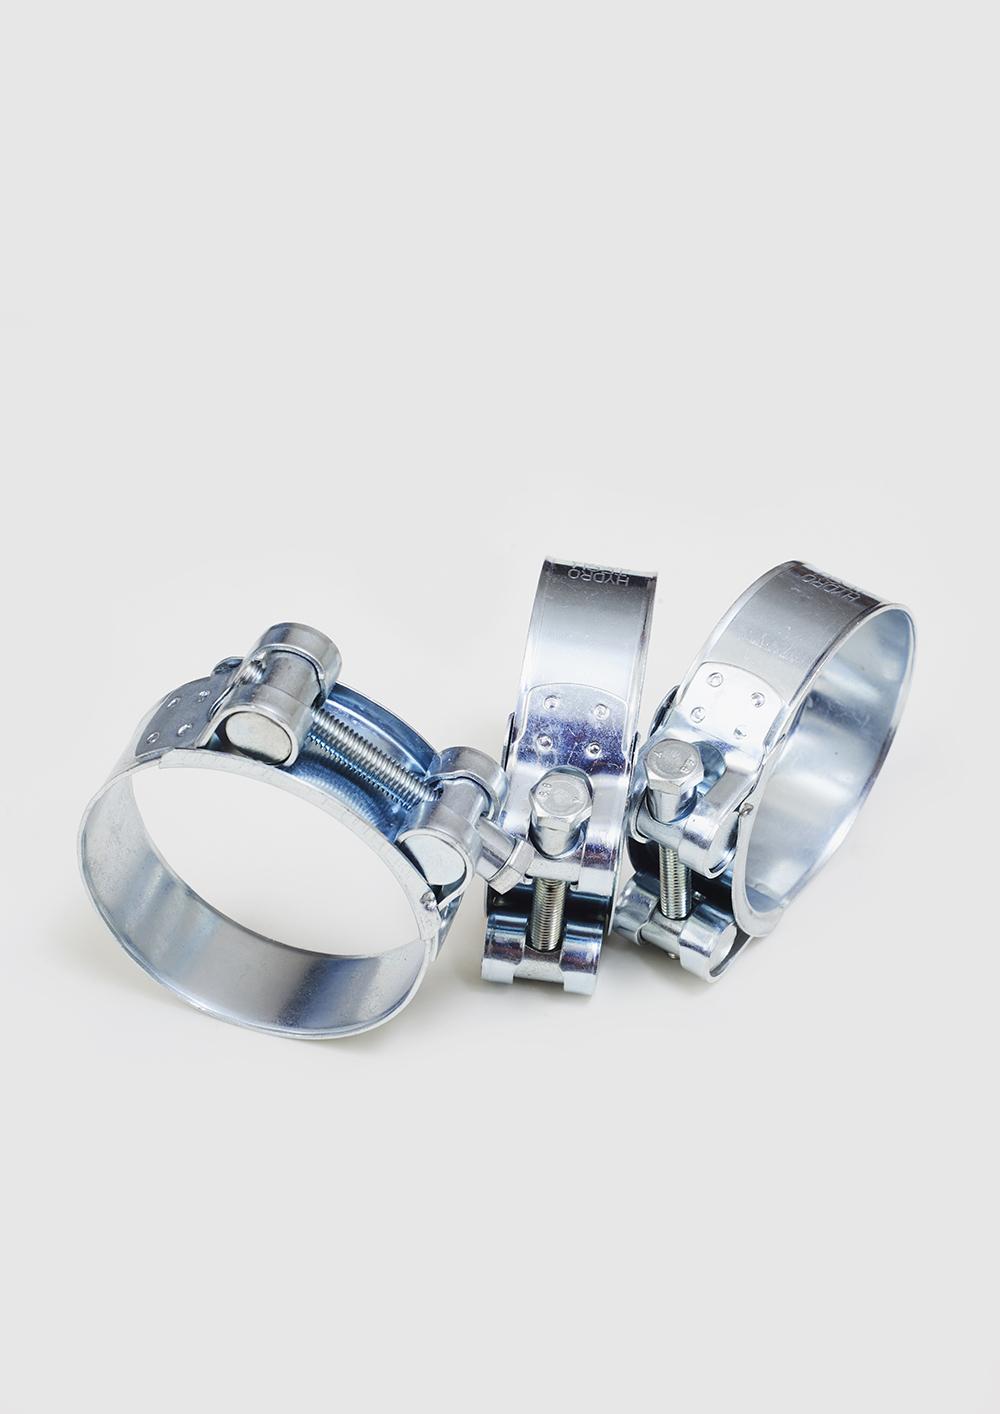 Femme fatale bracelet %284%29